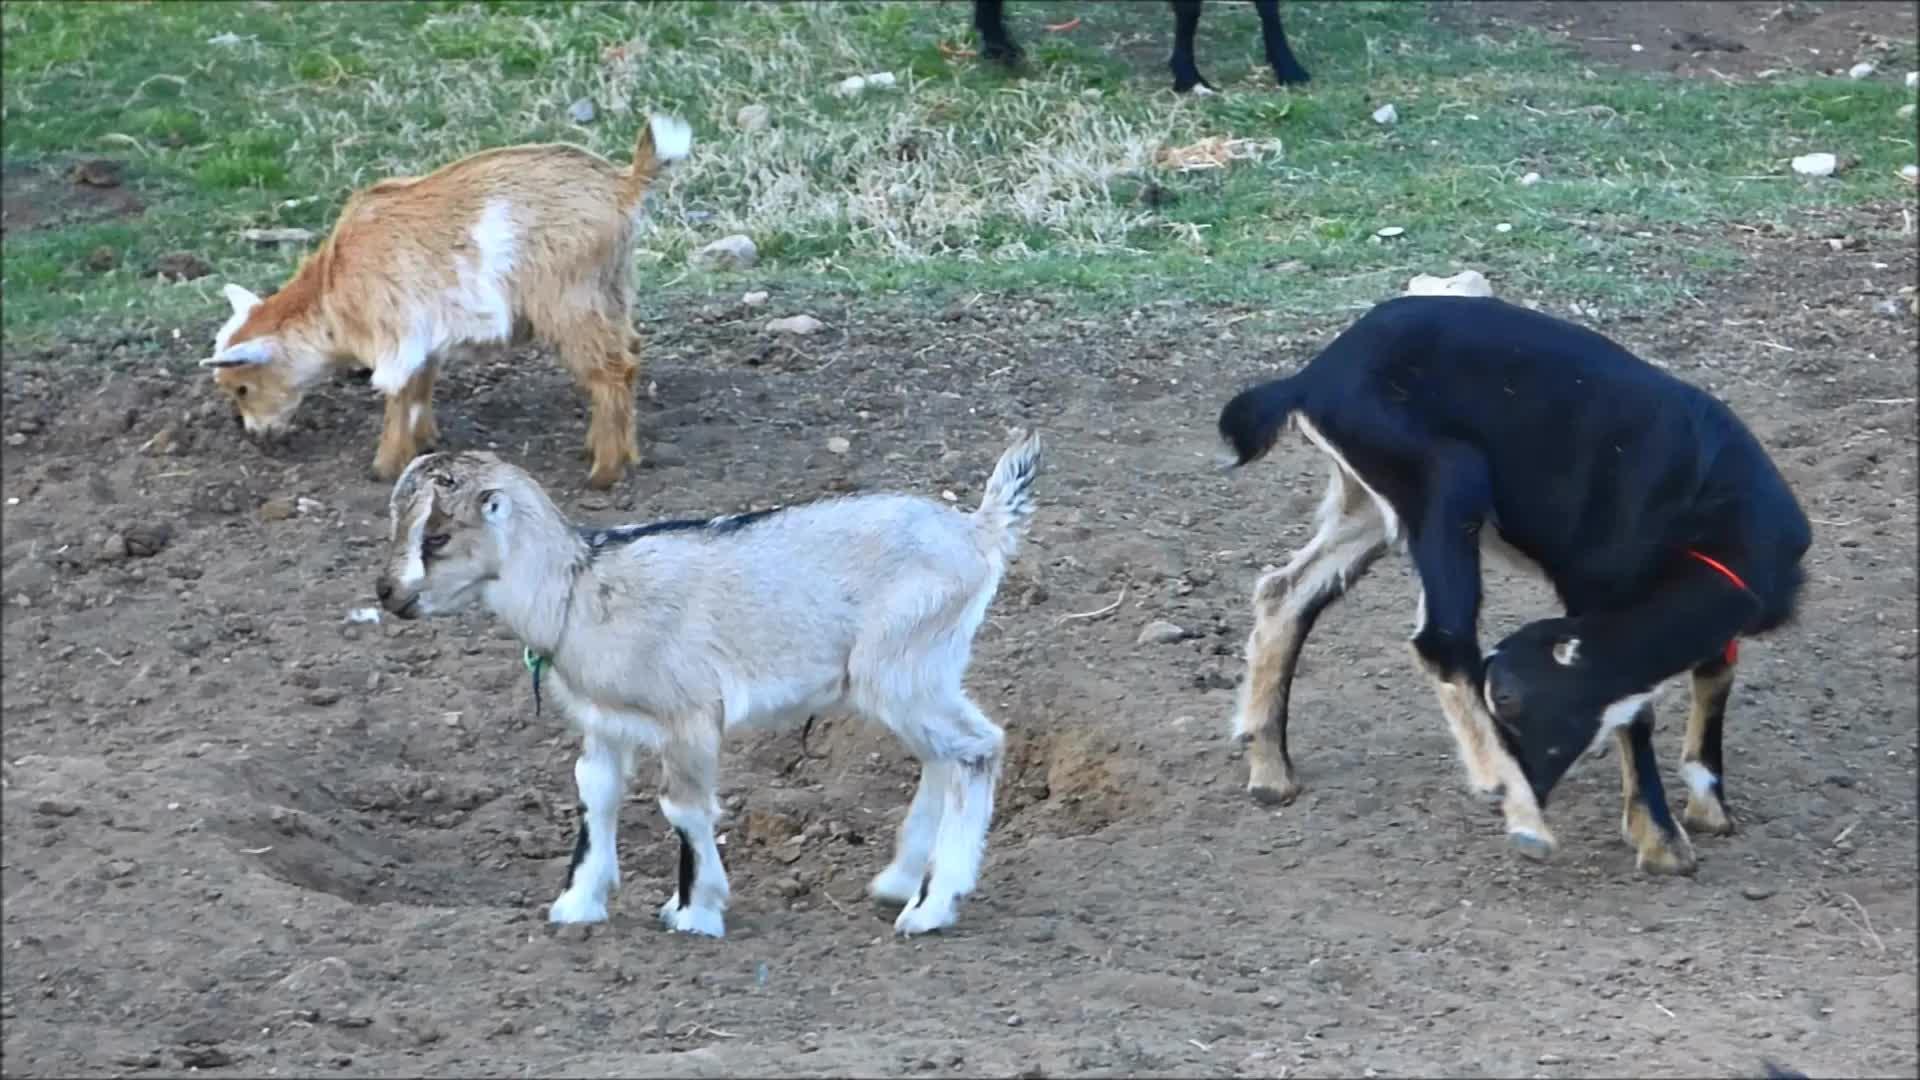 baby goat, cute, funny, goat, knsfarm, tippytaps, Lil Tippy Tap GIFs